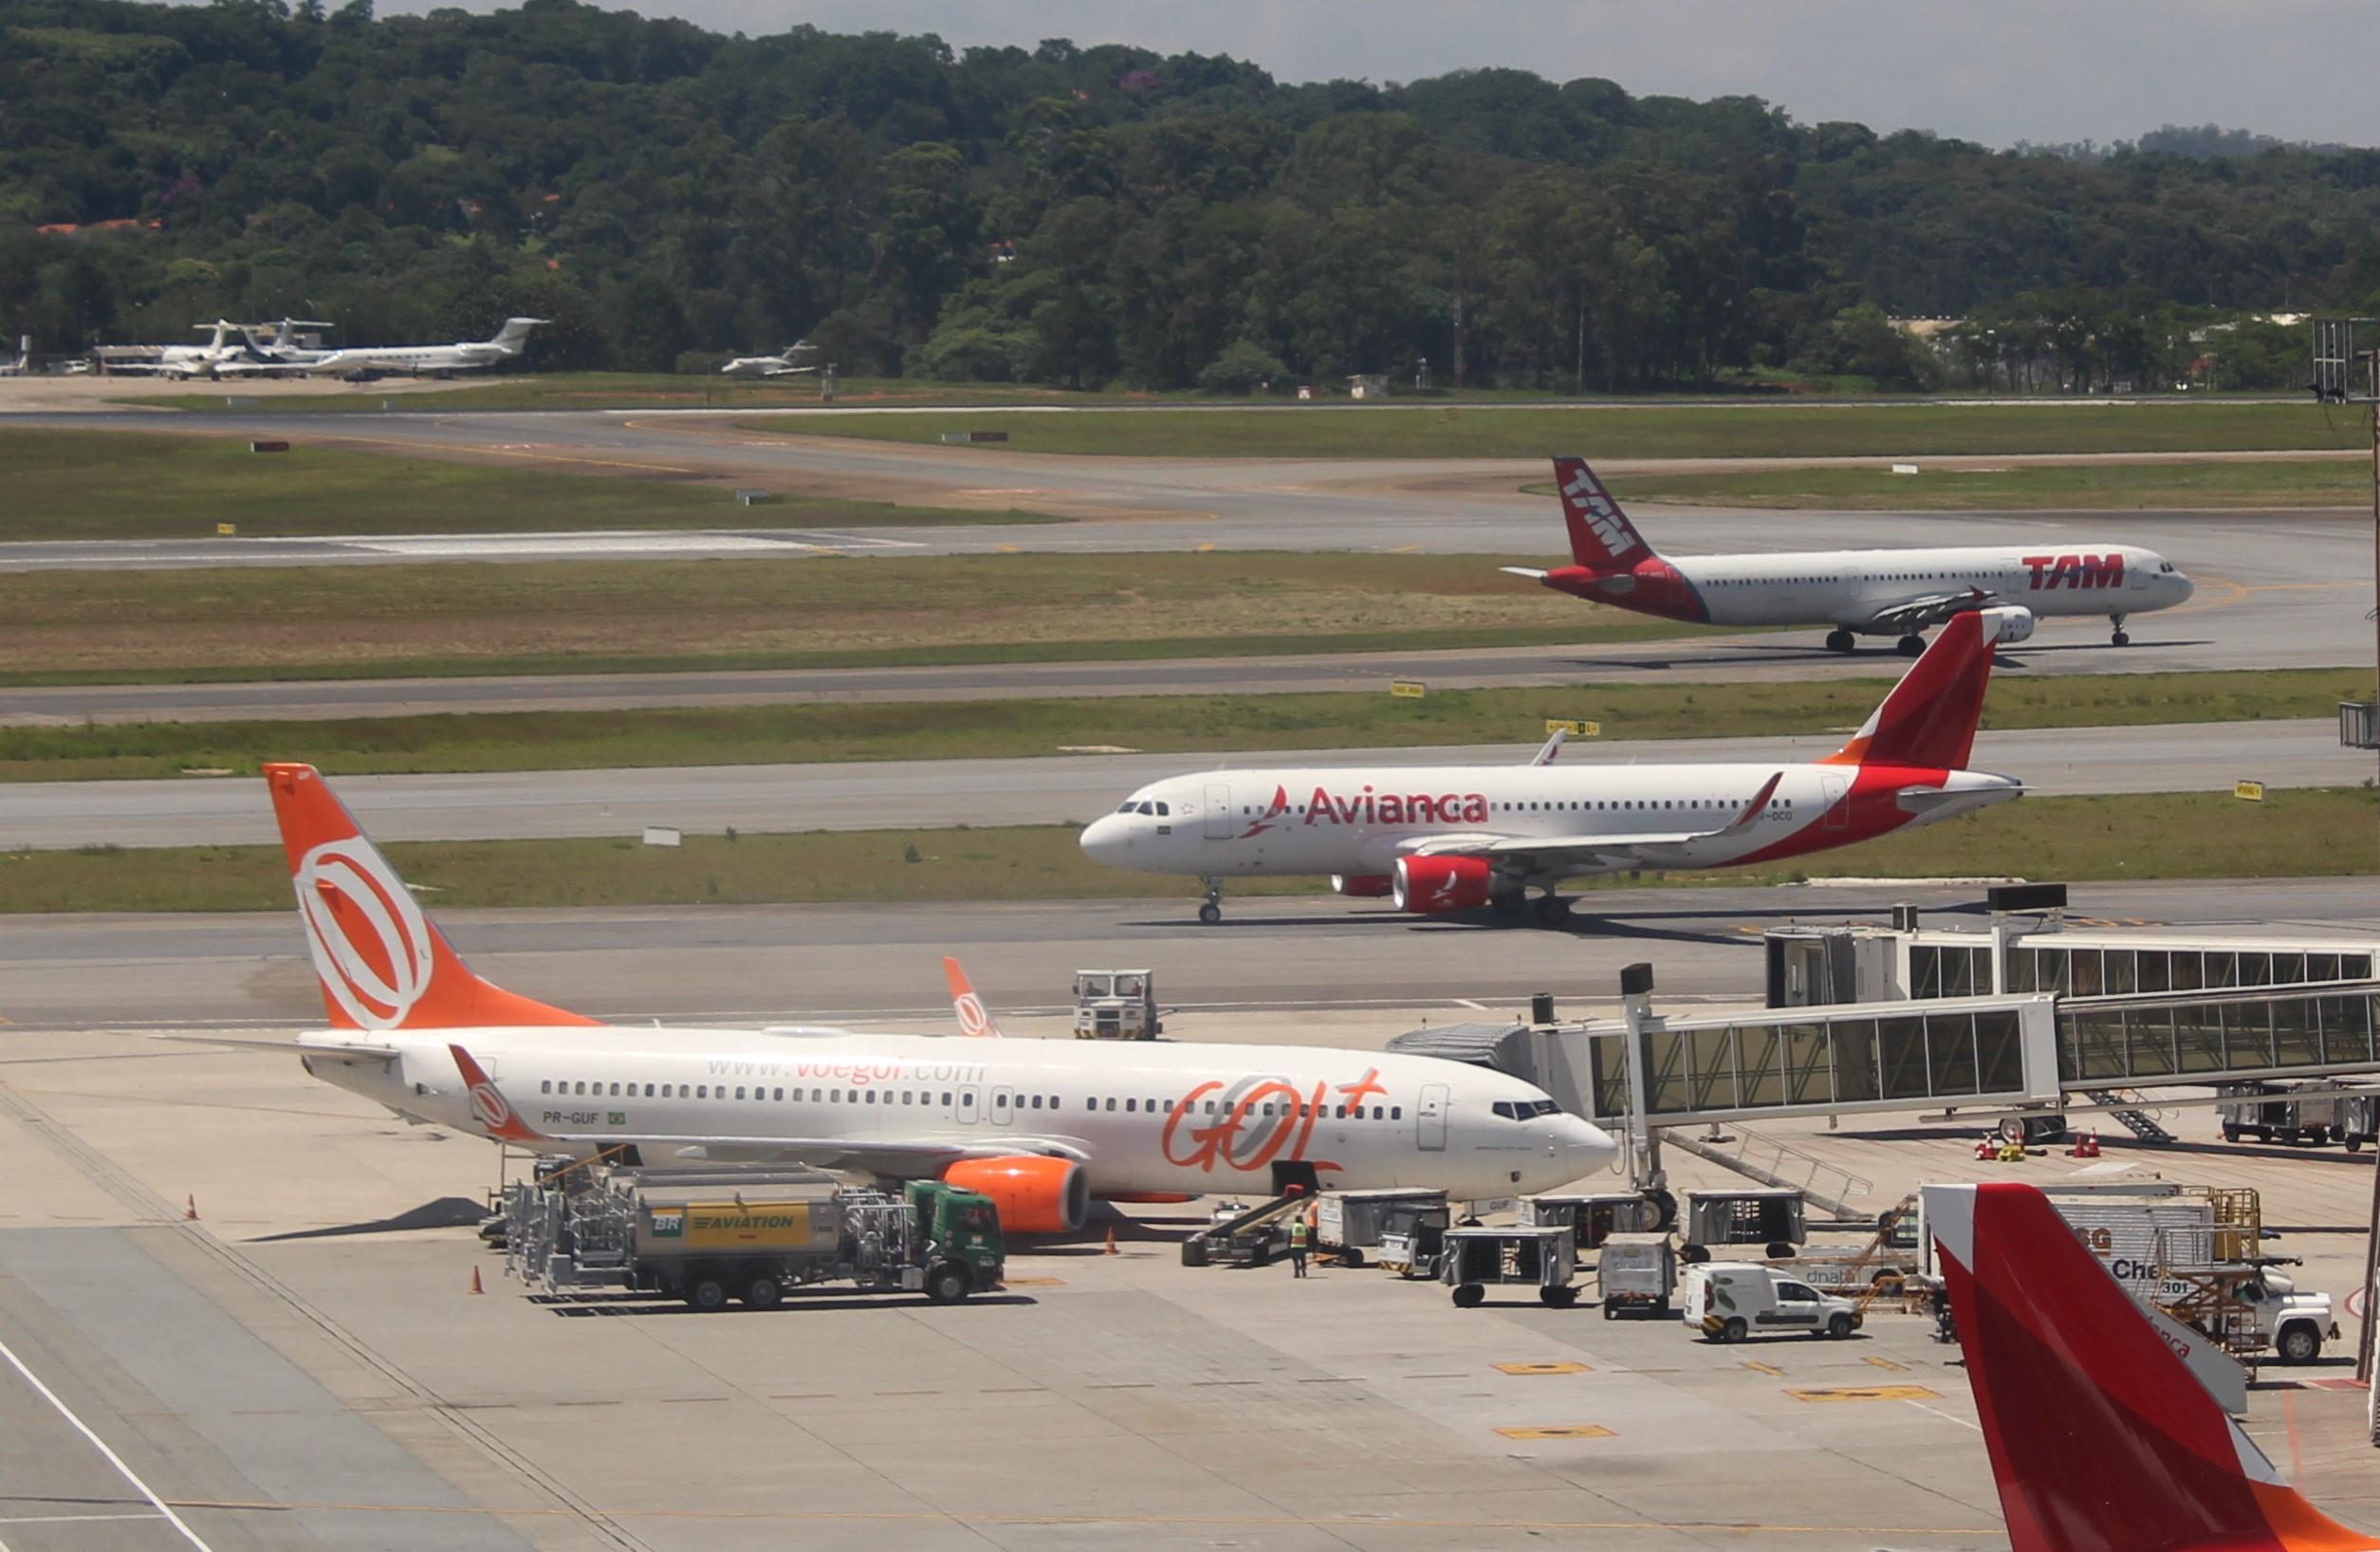 Aeroporto Guarulhos : Aeroporto de guarulhos tem sala crise inspirada na casa